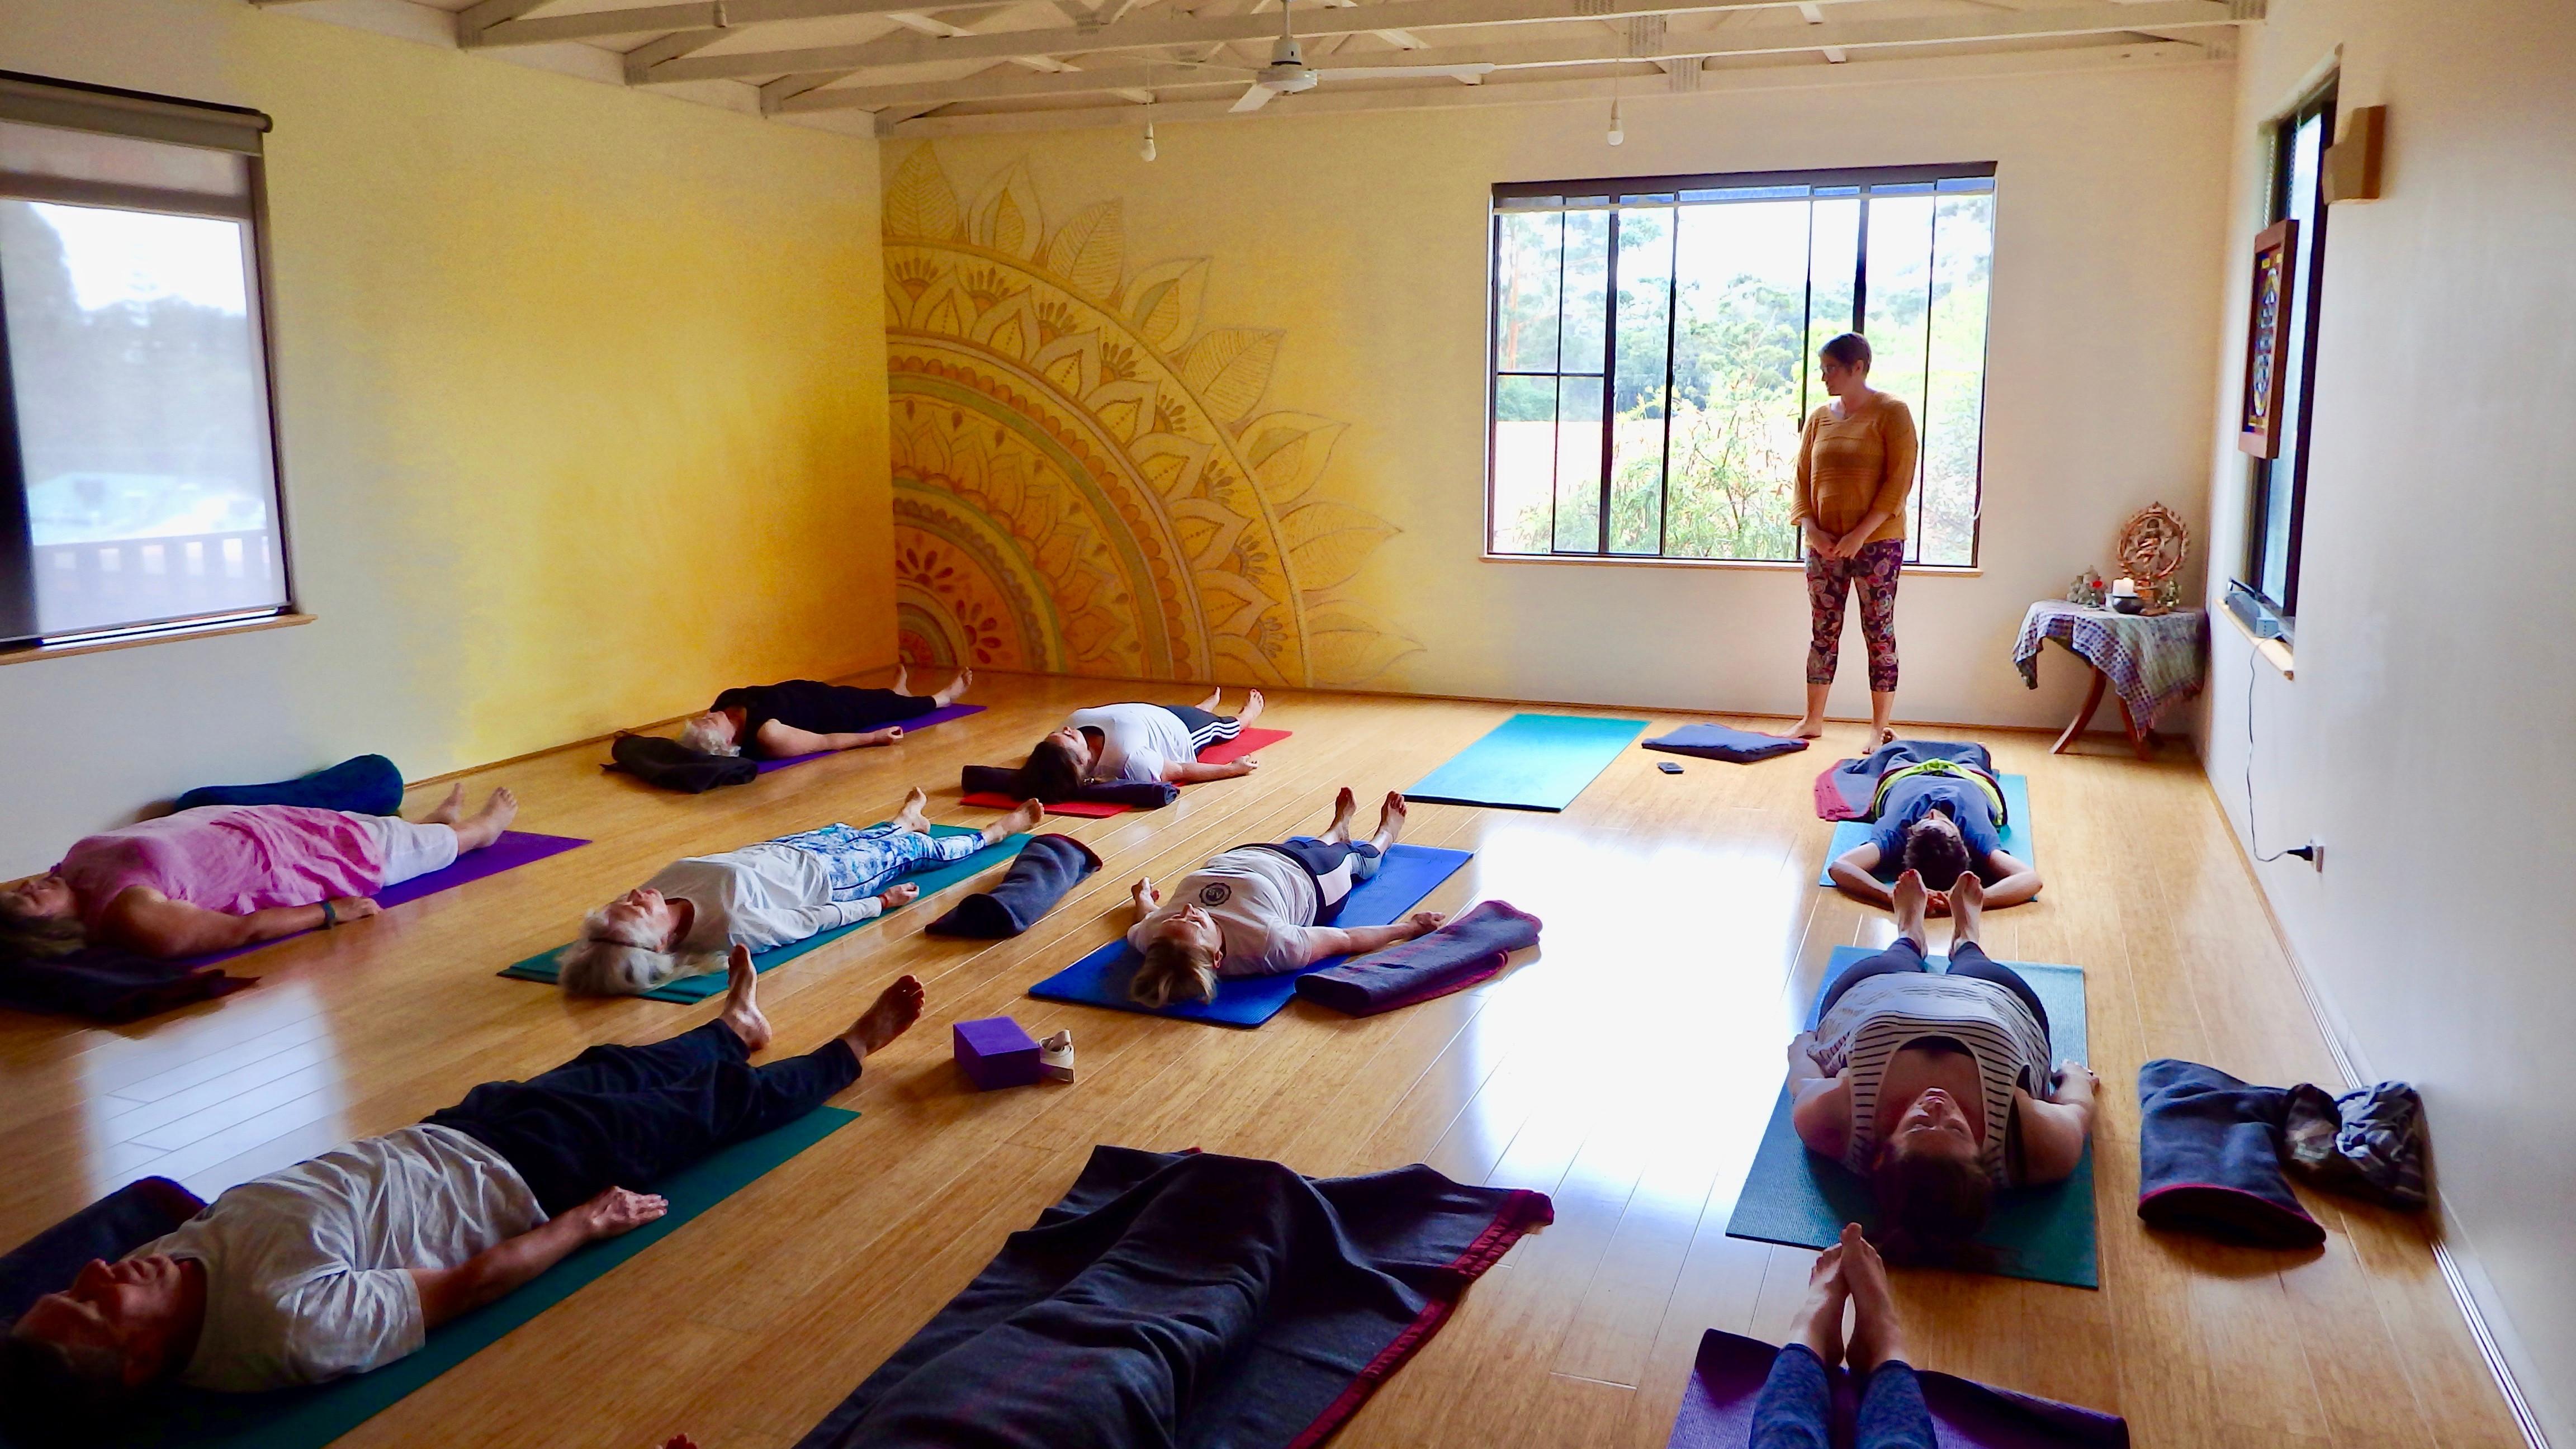 Fri - Absolute Beginners Yoga